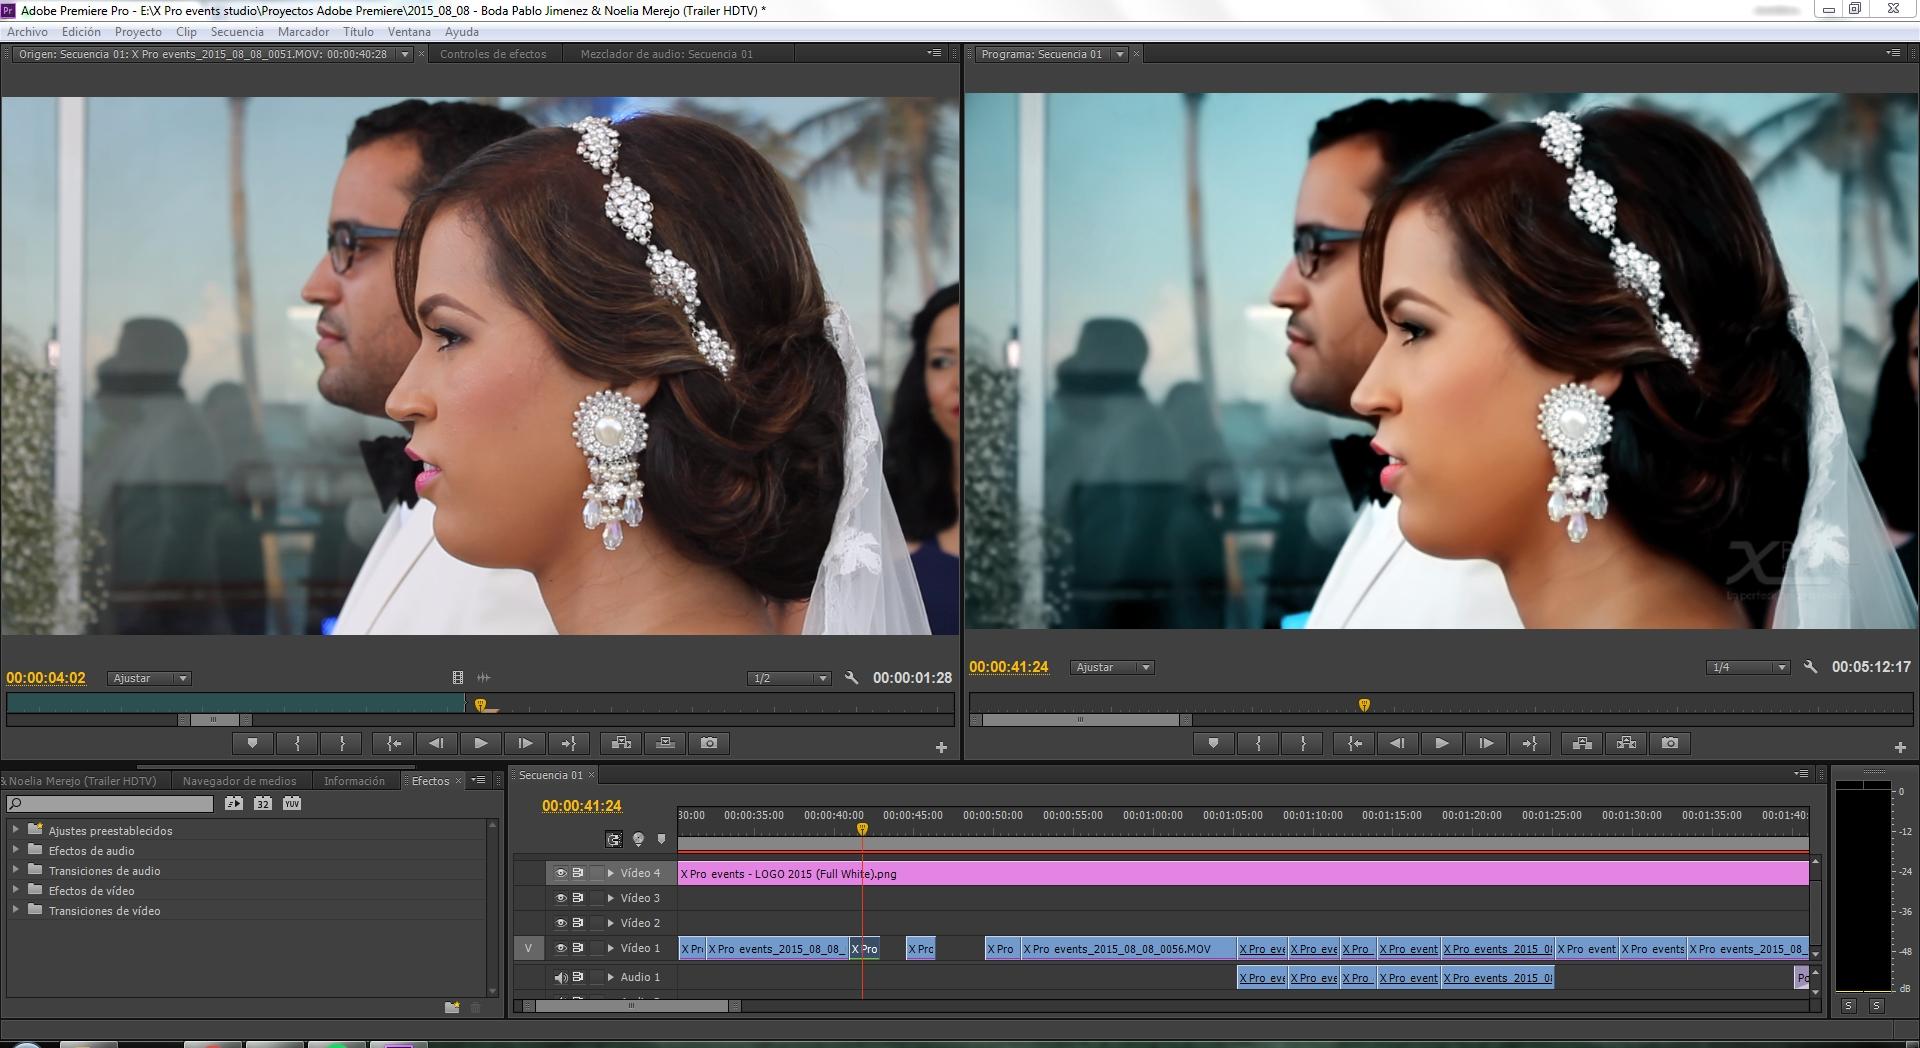 X Pro events studio - Editando trailer Boda Pablo & Noelia